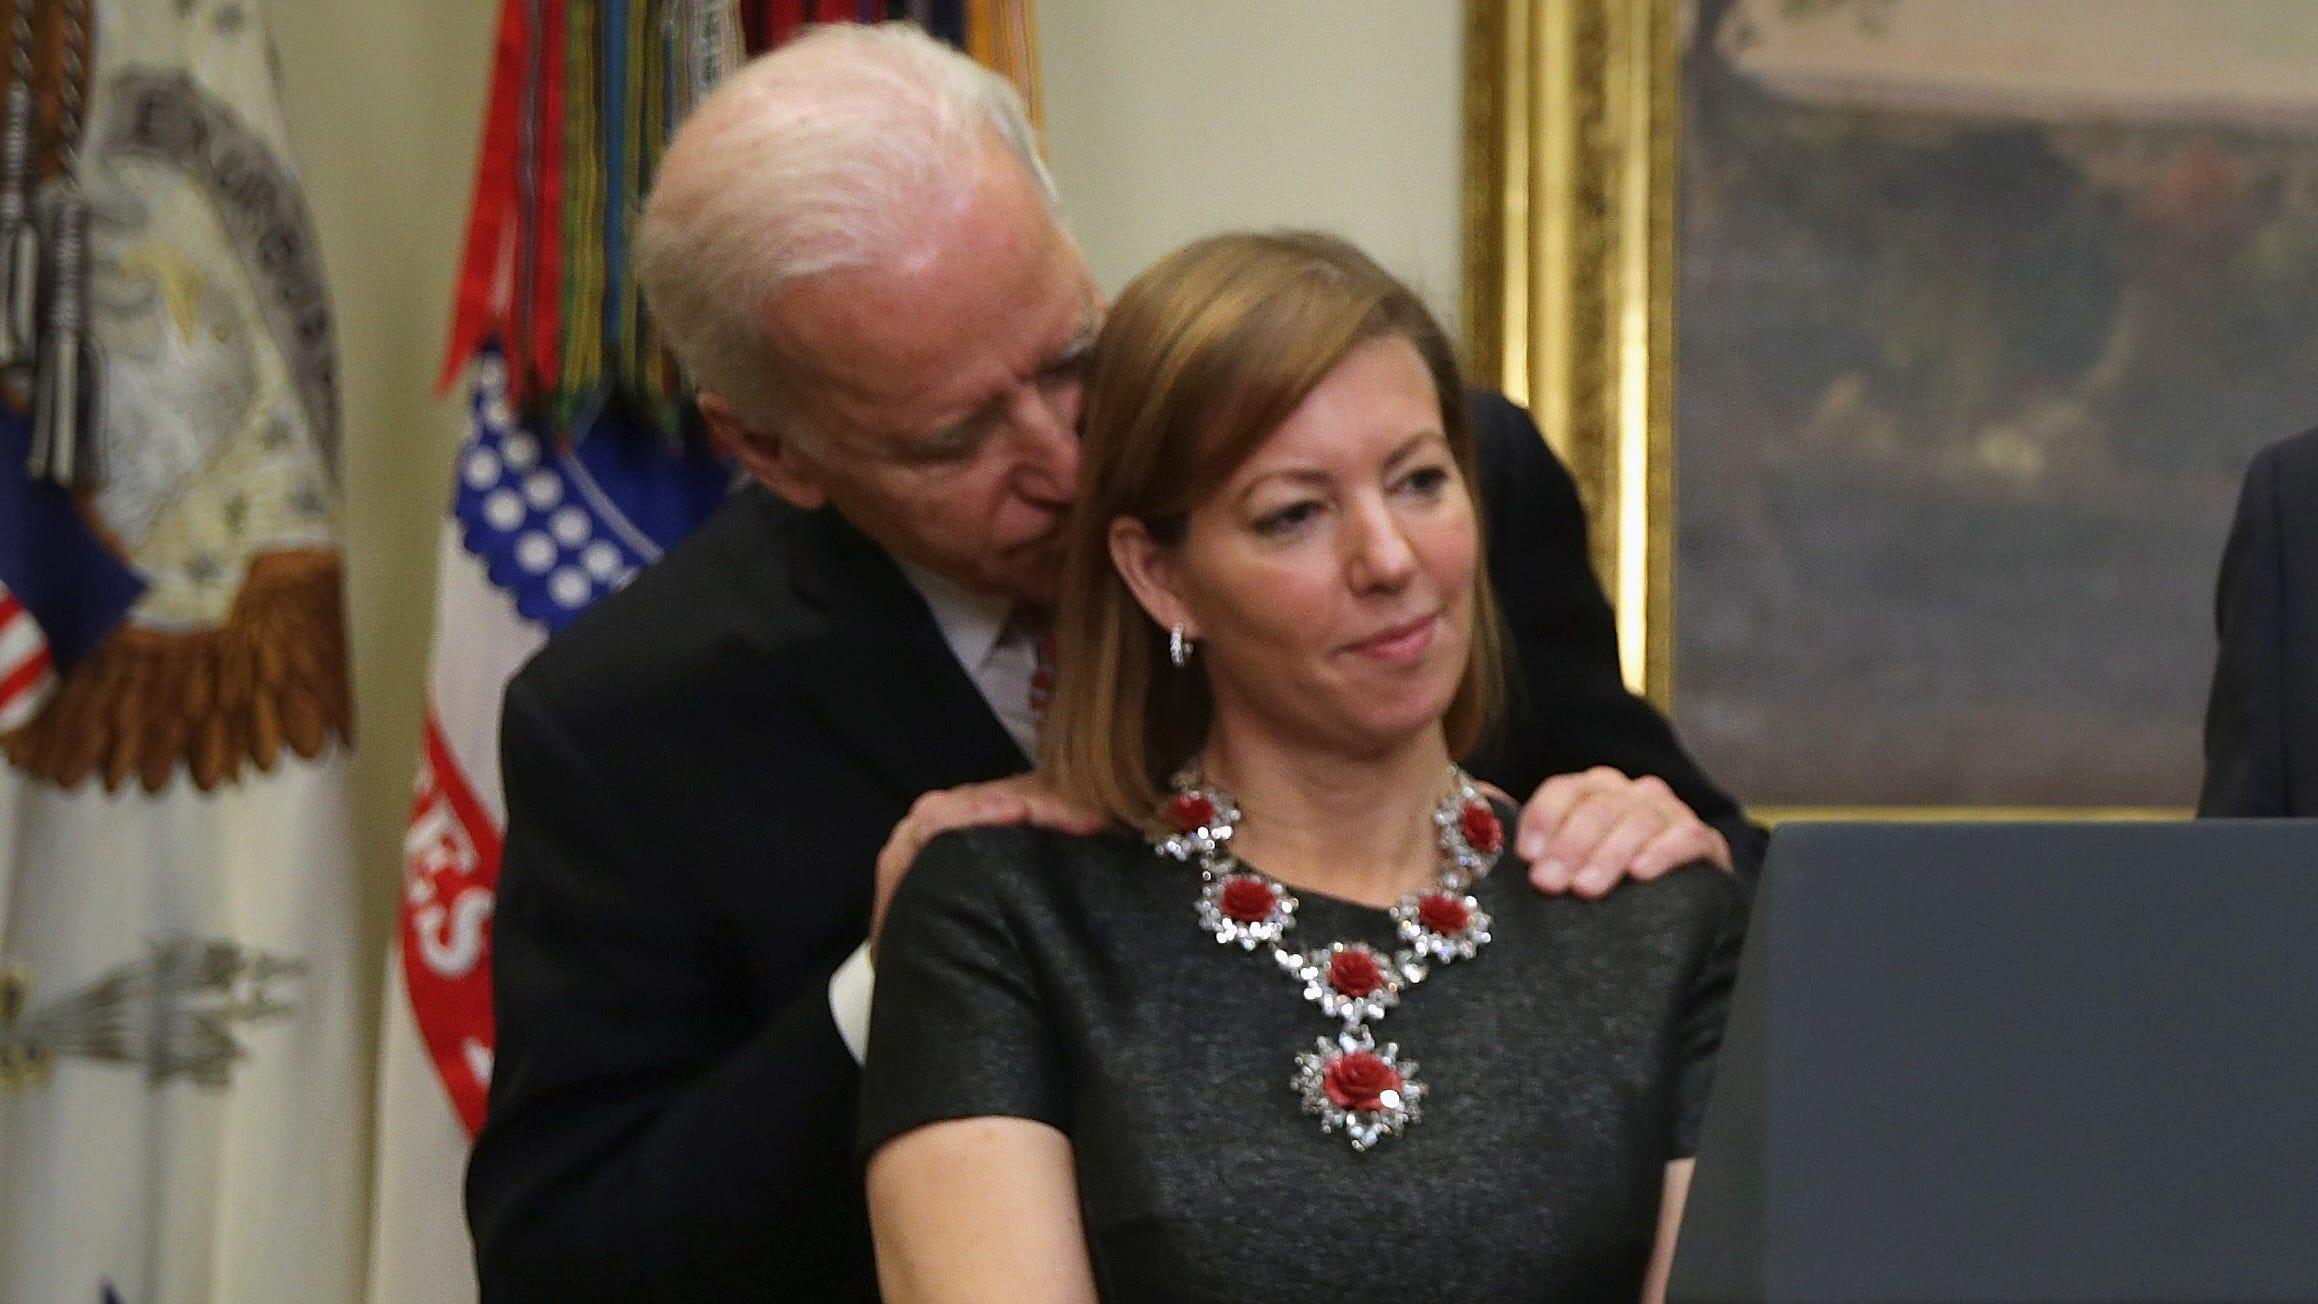 Joe Biden allegation: Stephanie Carter says viral photo is ...